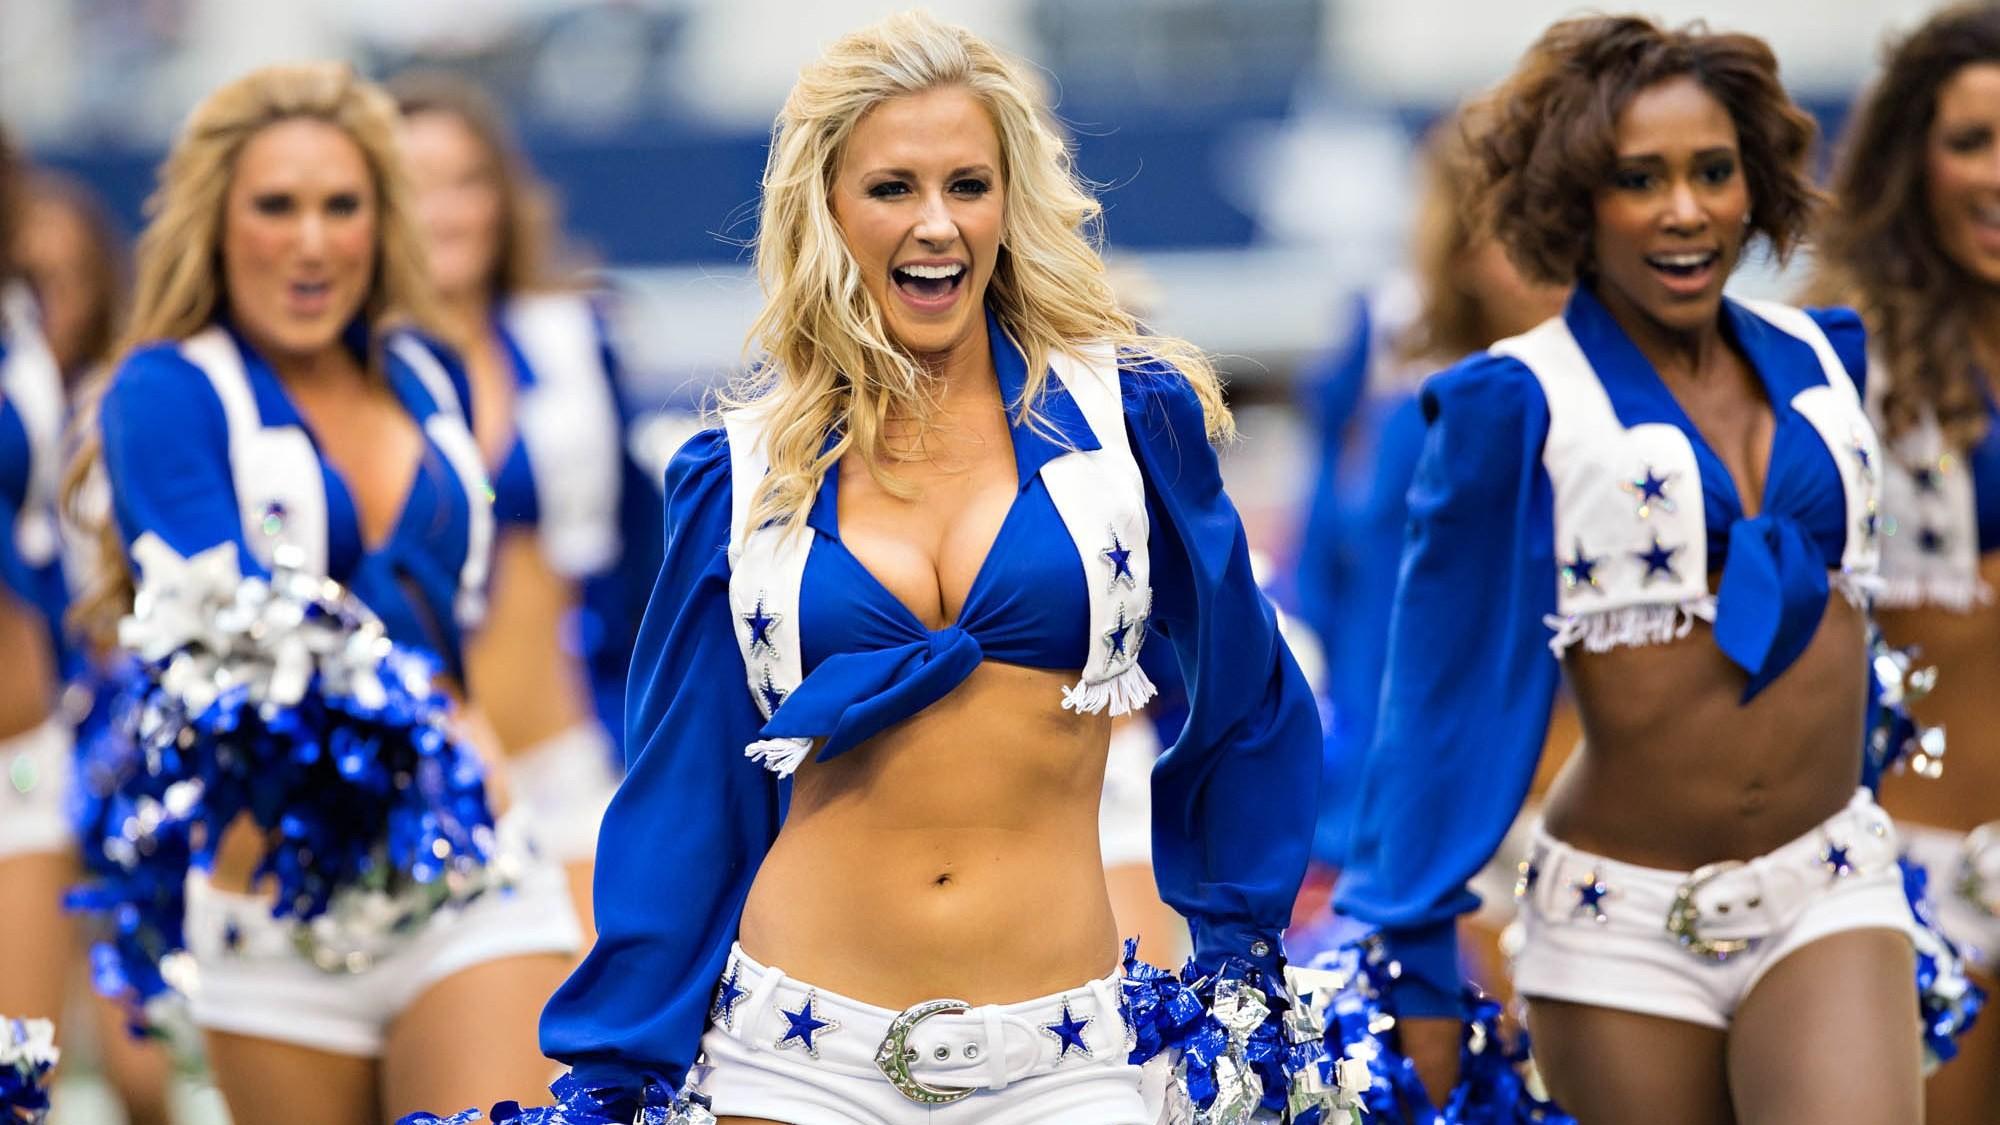 Image: https://coedmagazine.files.wordpress.com/2016/09/dallas-cowboys- cheerleaders.jpg?quality=88